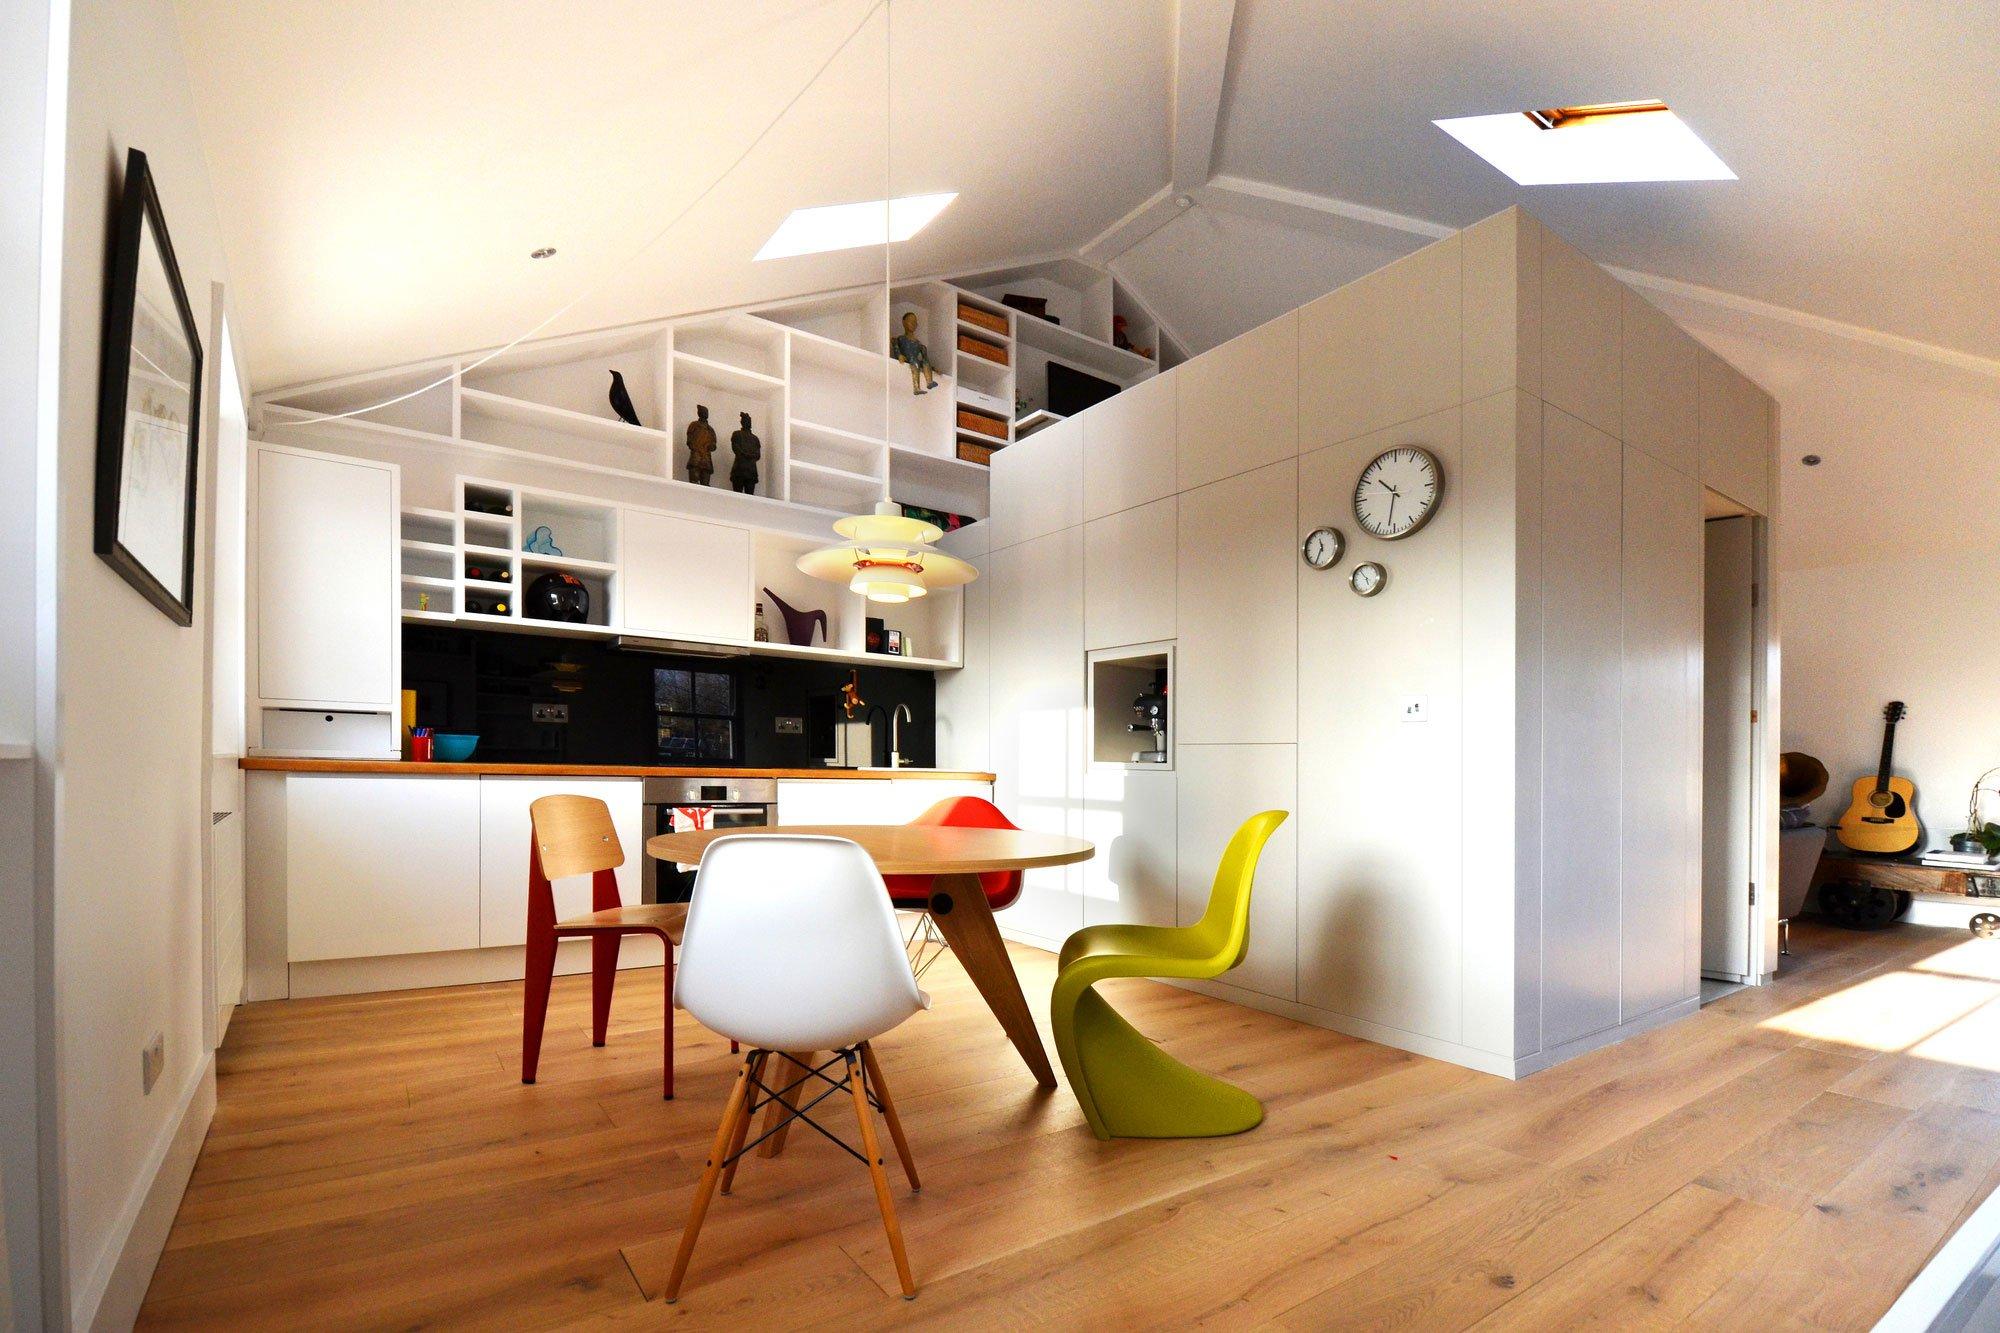 loft-space-in-camden-02